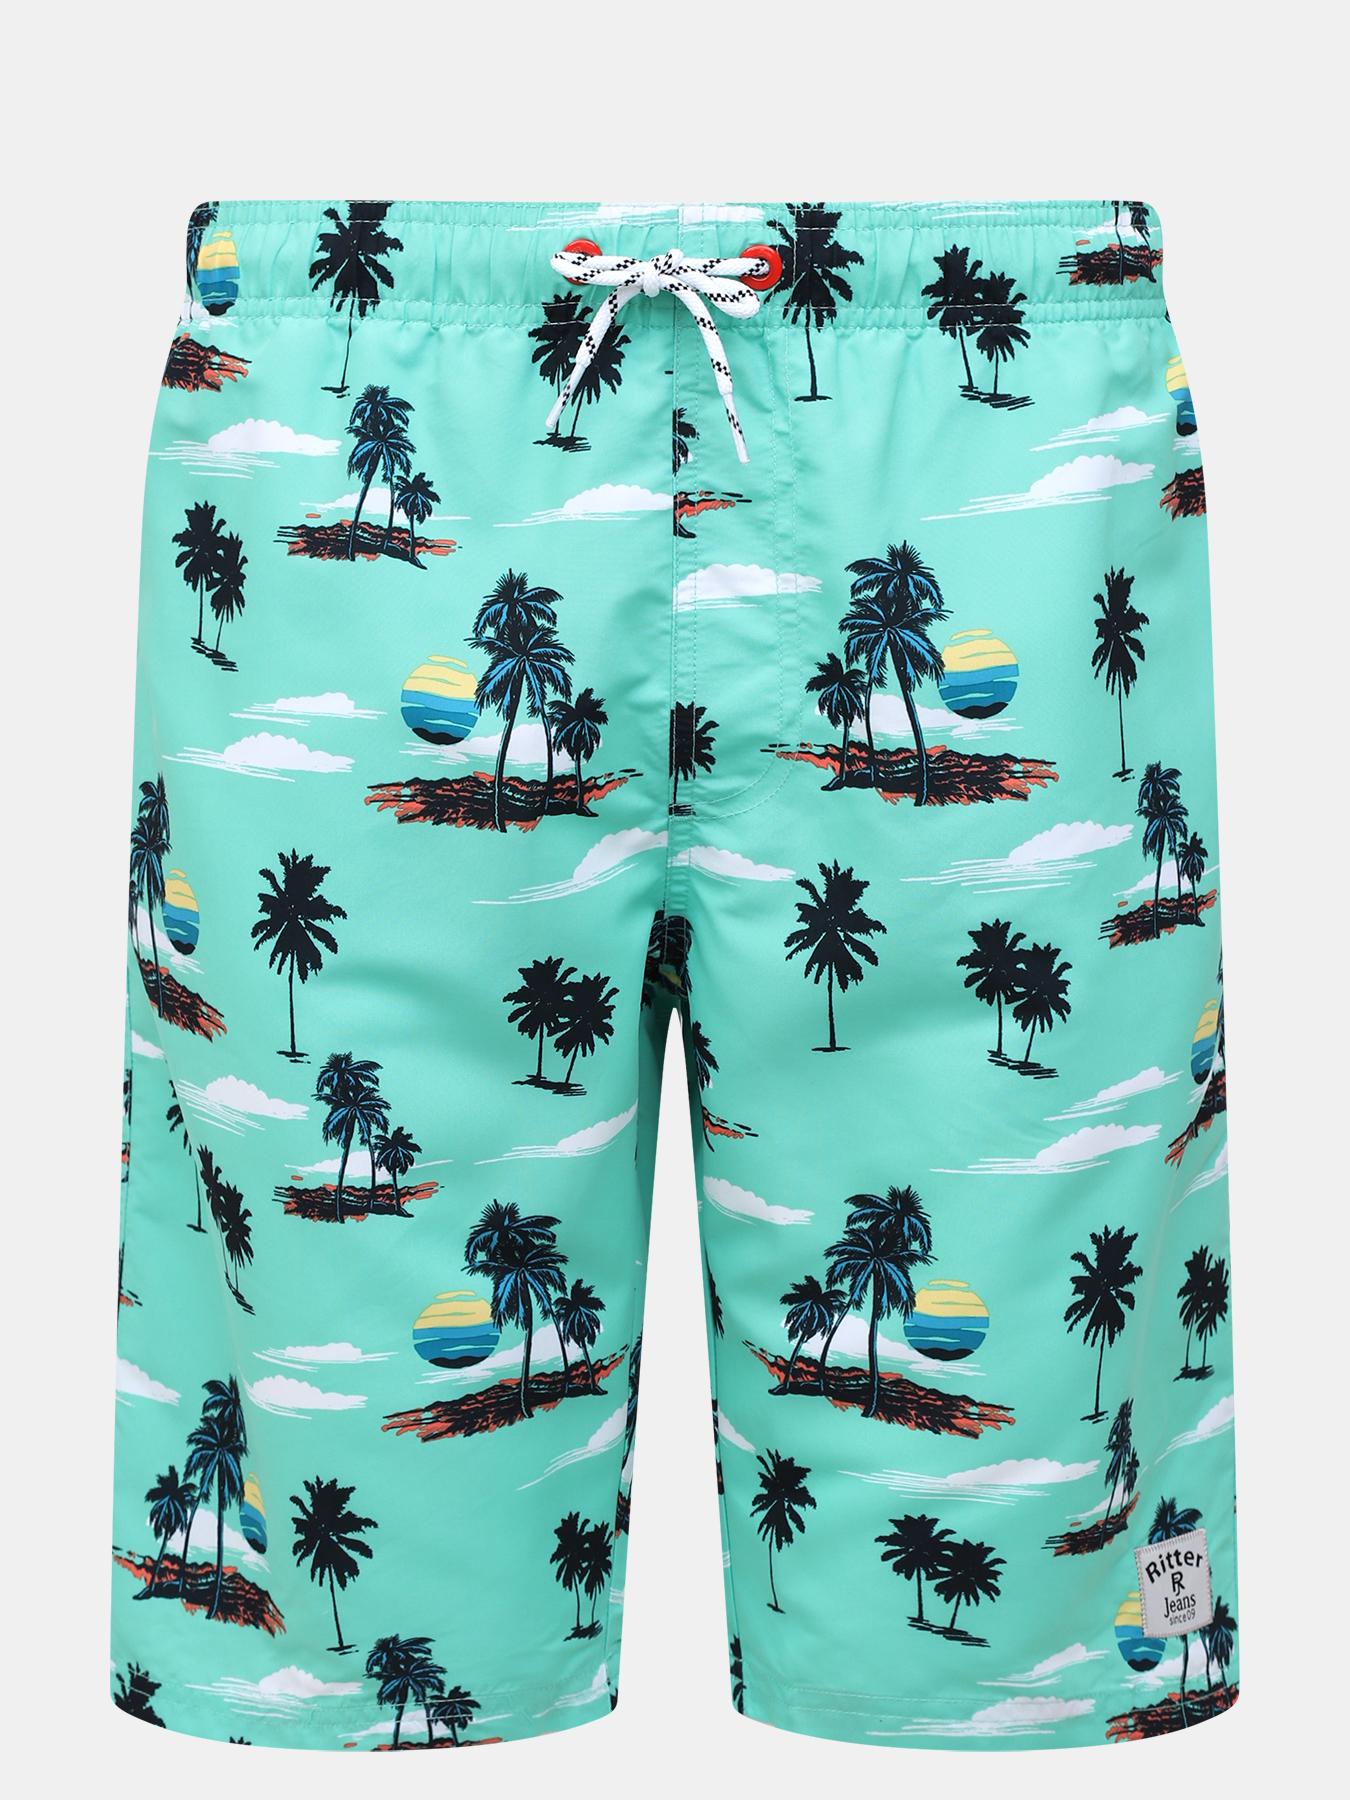 Плавательные шорты Ritter Jeans Плавательные шорты